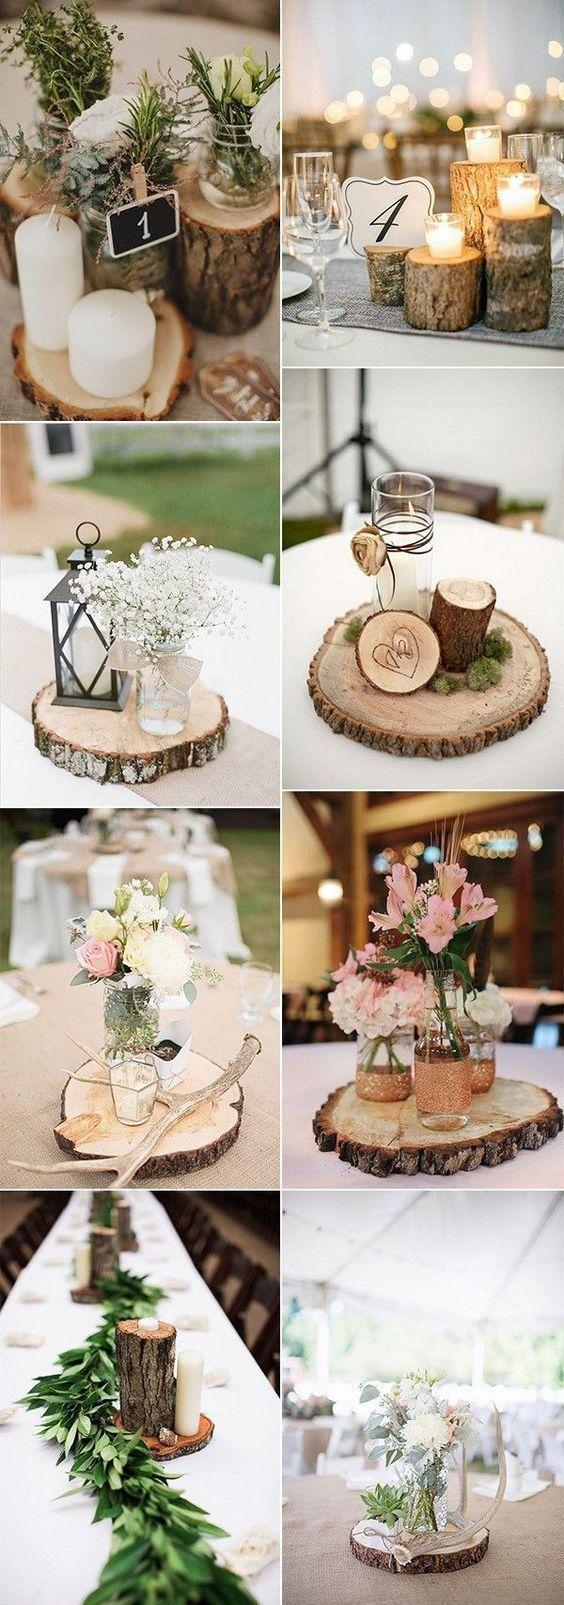 rustic wedding centerpiece ideas with tree stumps #wedding ideas #wedding ...  #... #holzdekoration